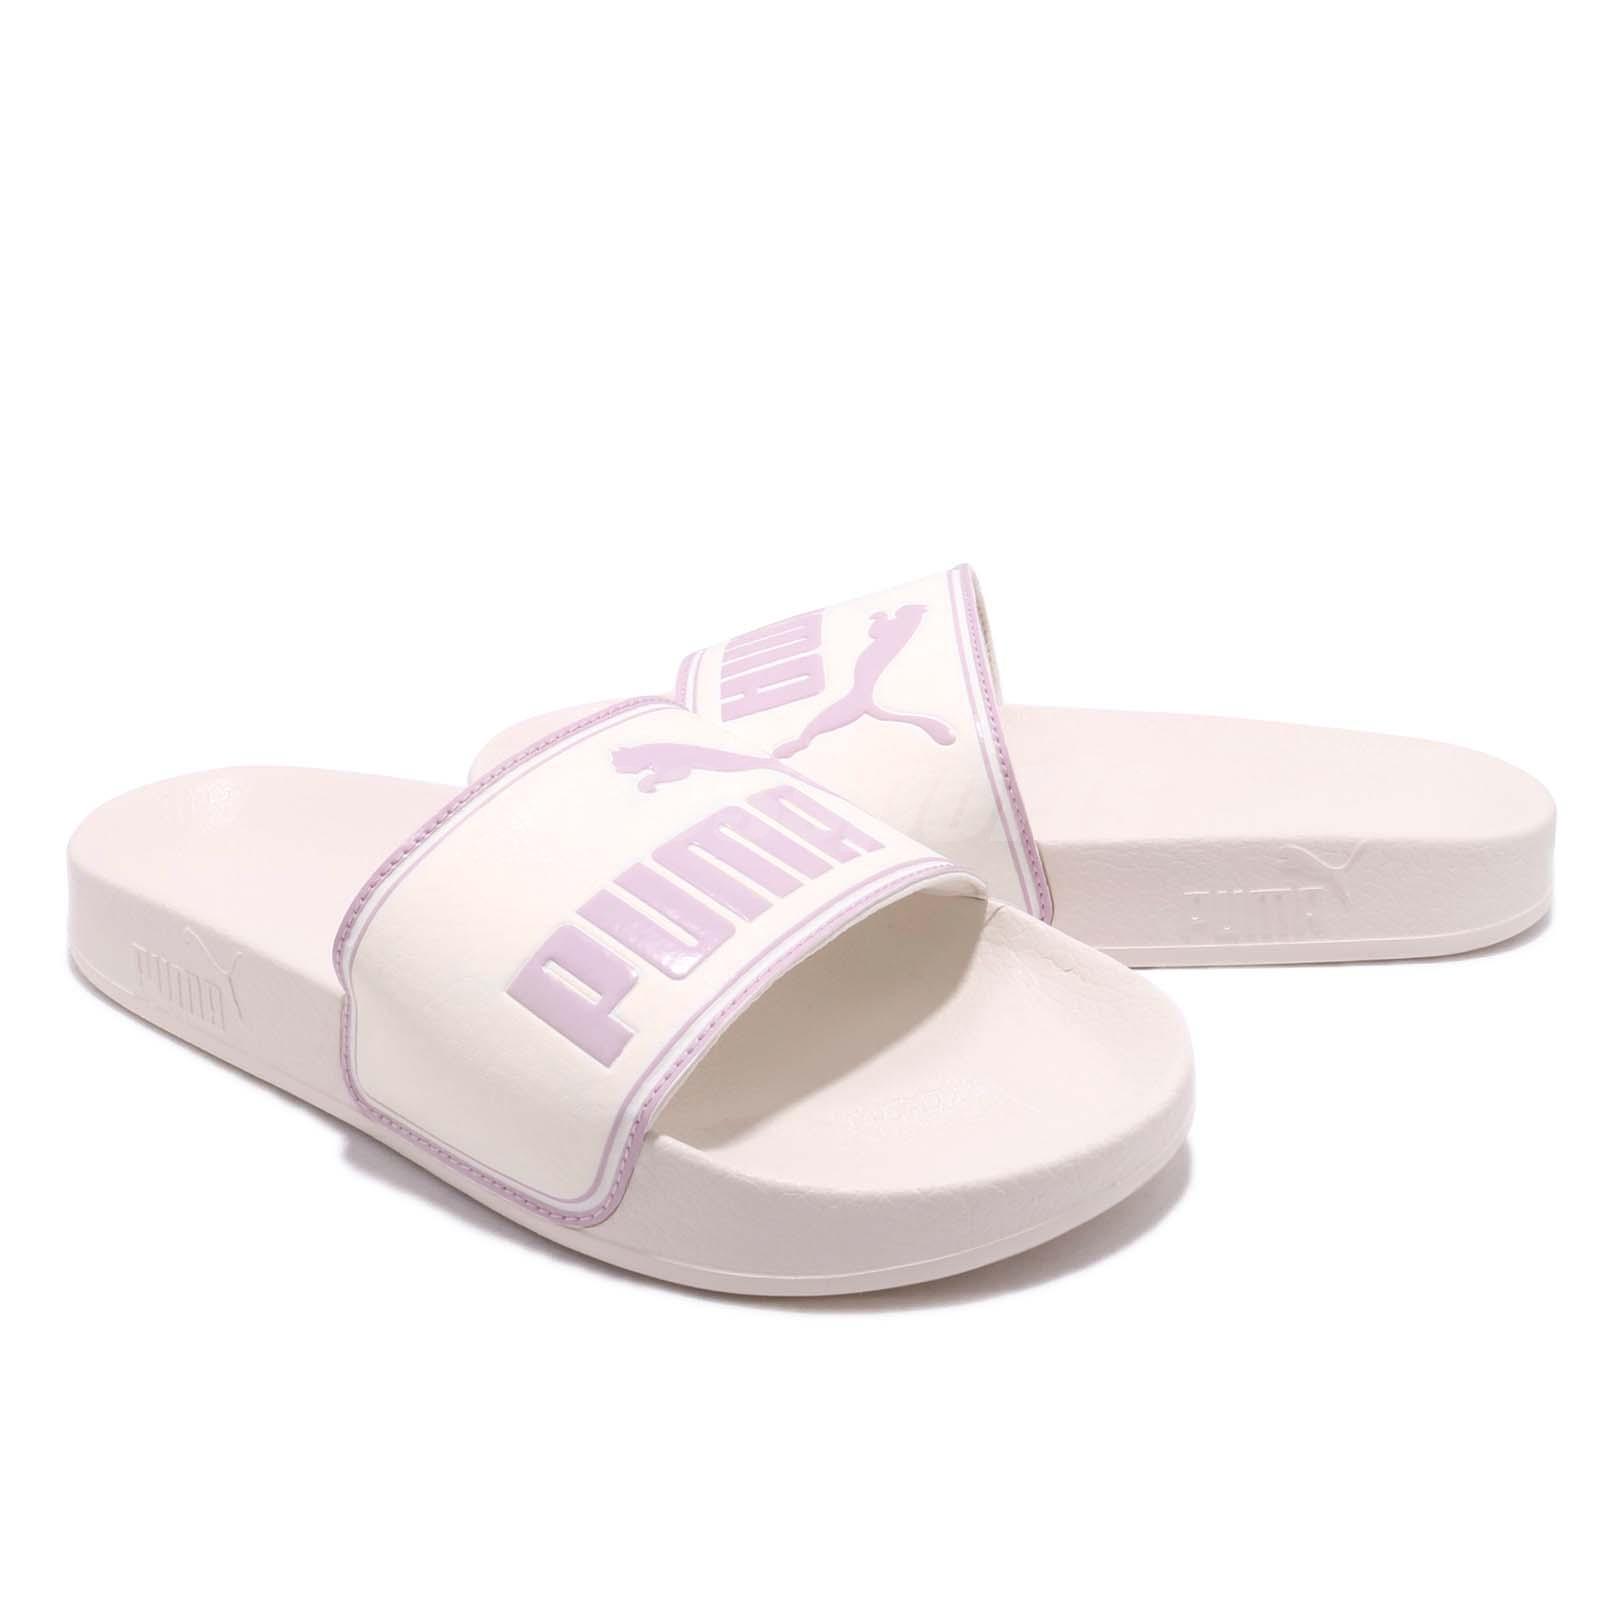 Puma Leadcat Whisper White Orchid Men Women Sports Sandals Slides 360263-12